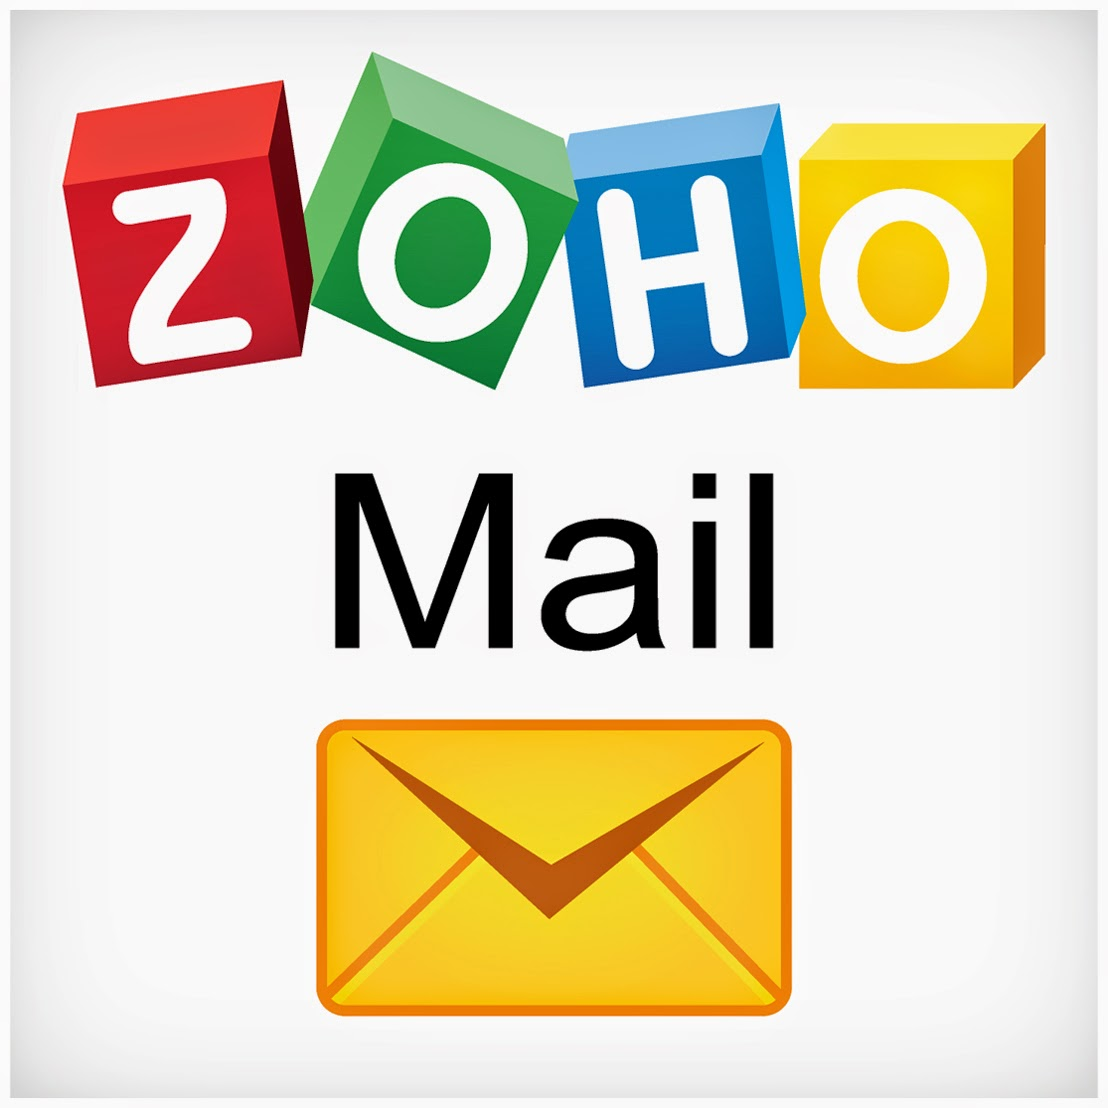 Zohomail